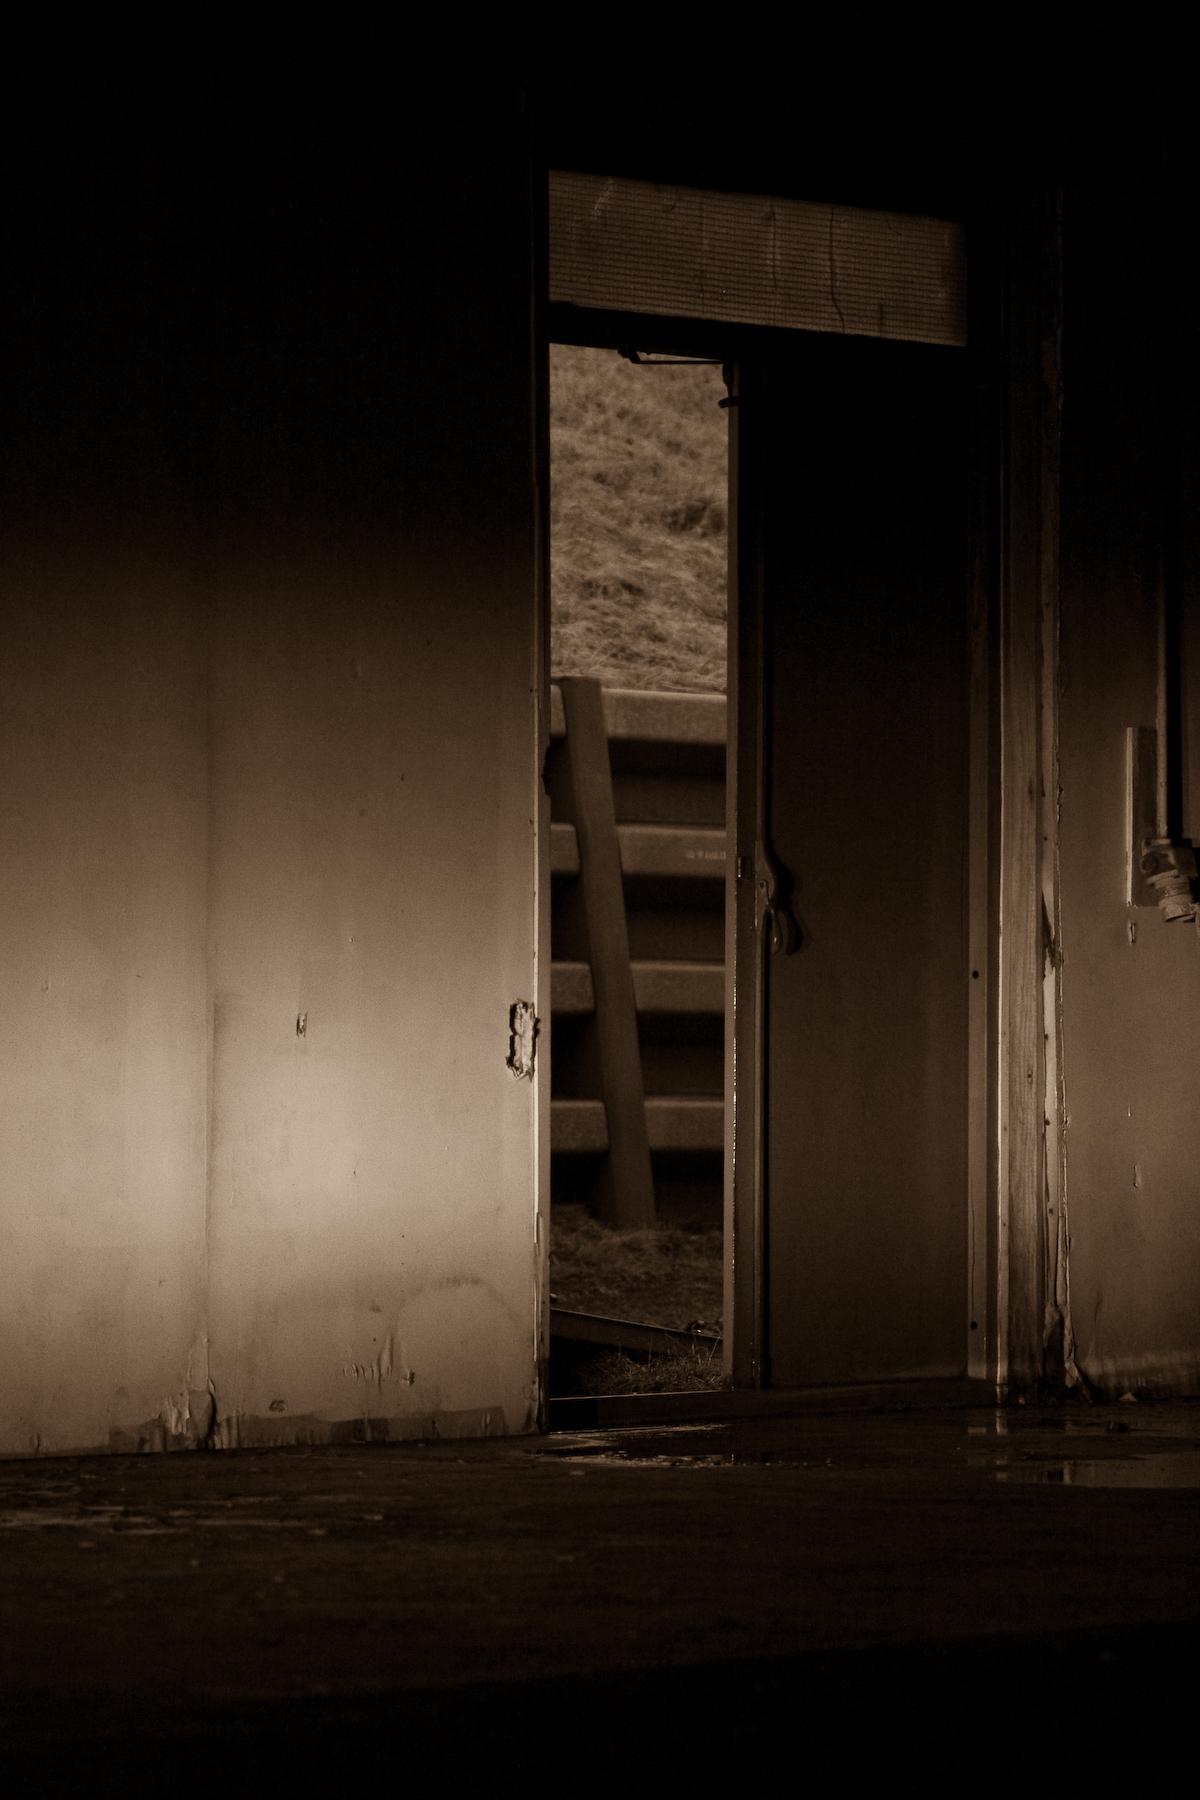 Abandoned warehouse, Abandoned, Building, Dark, Door, HQ Photo